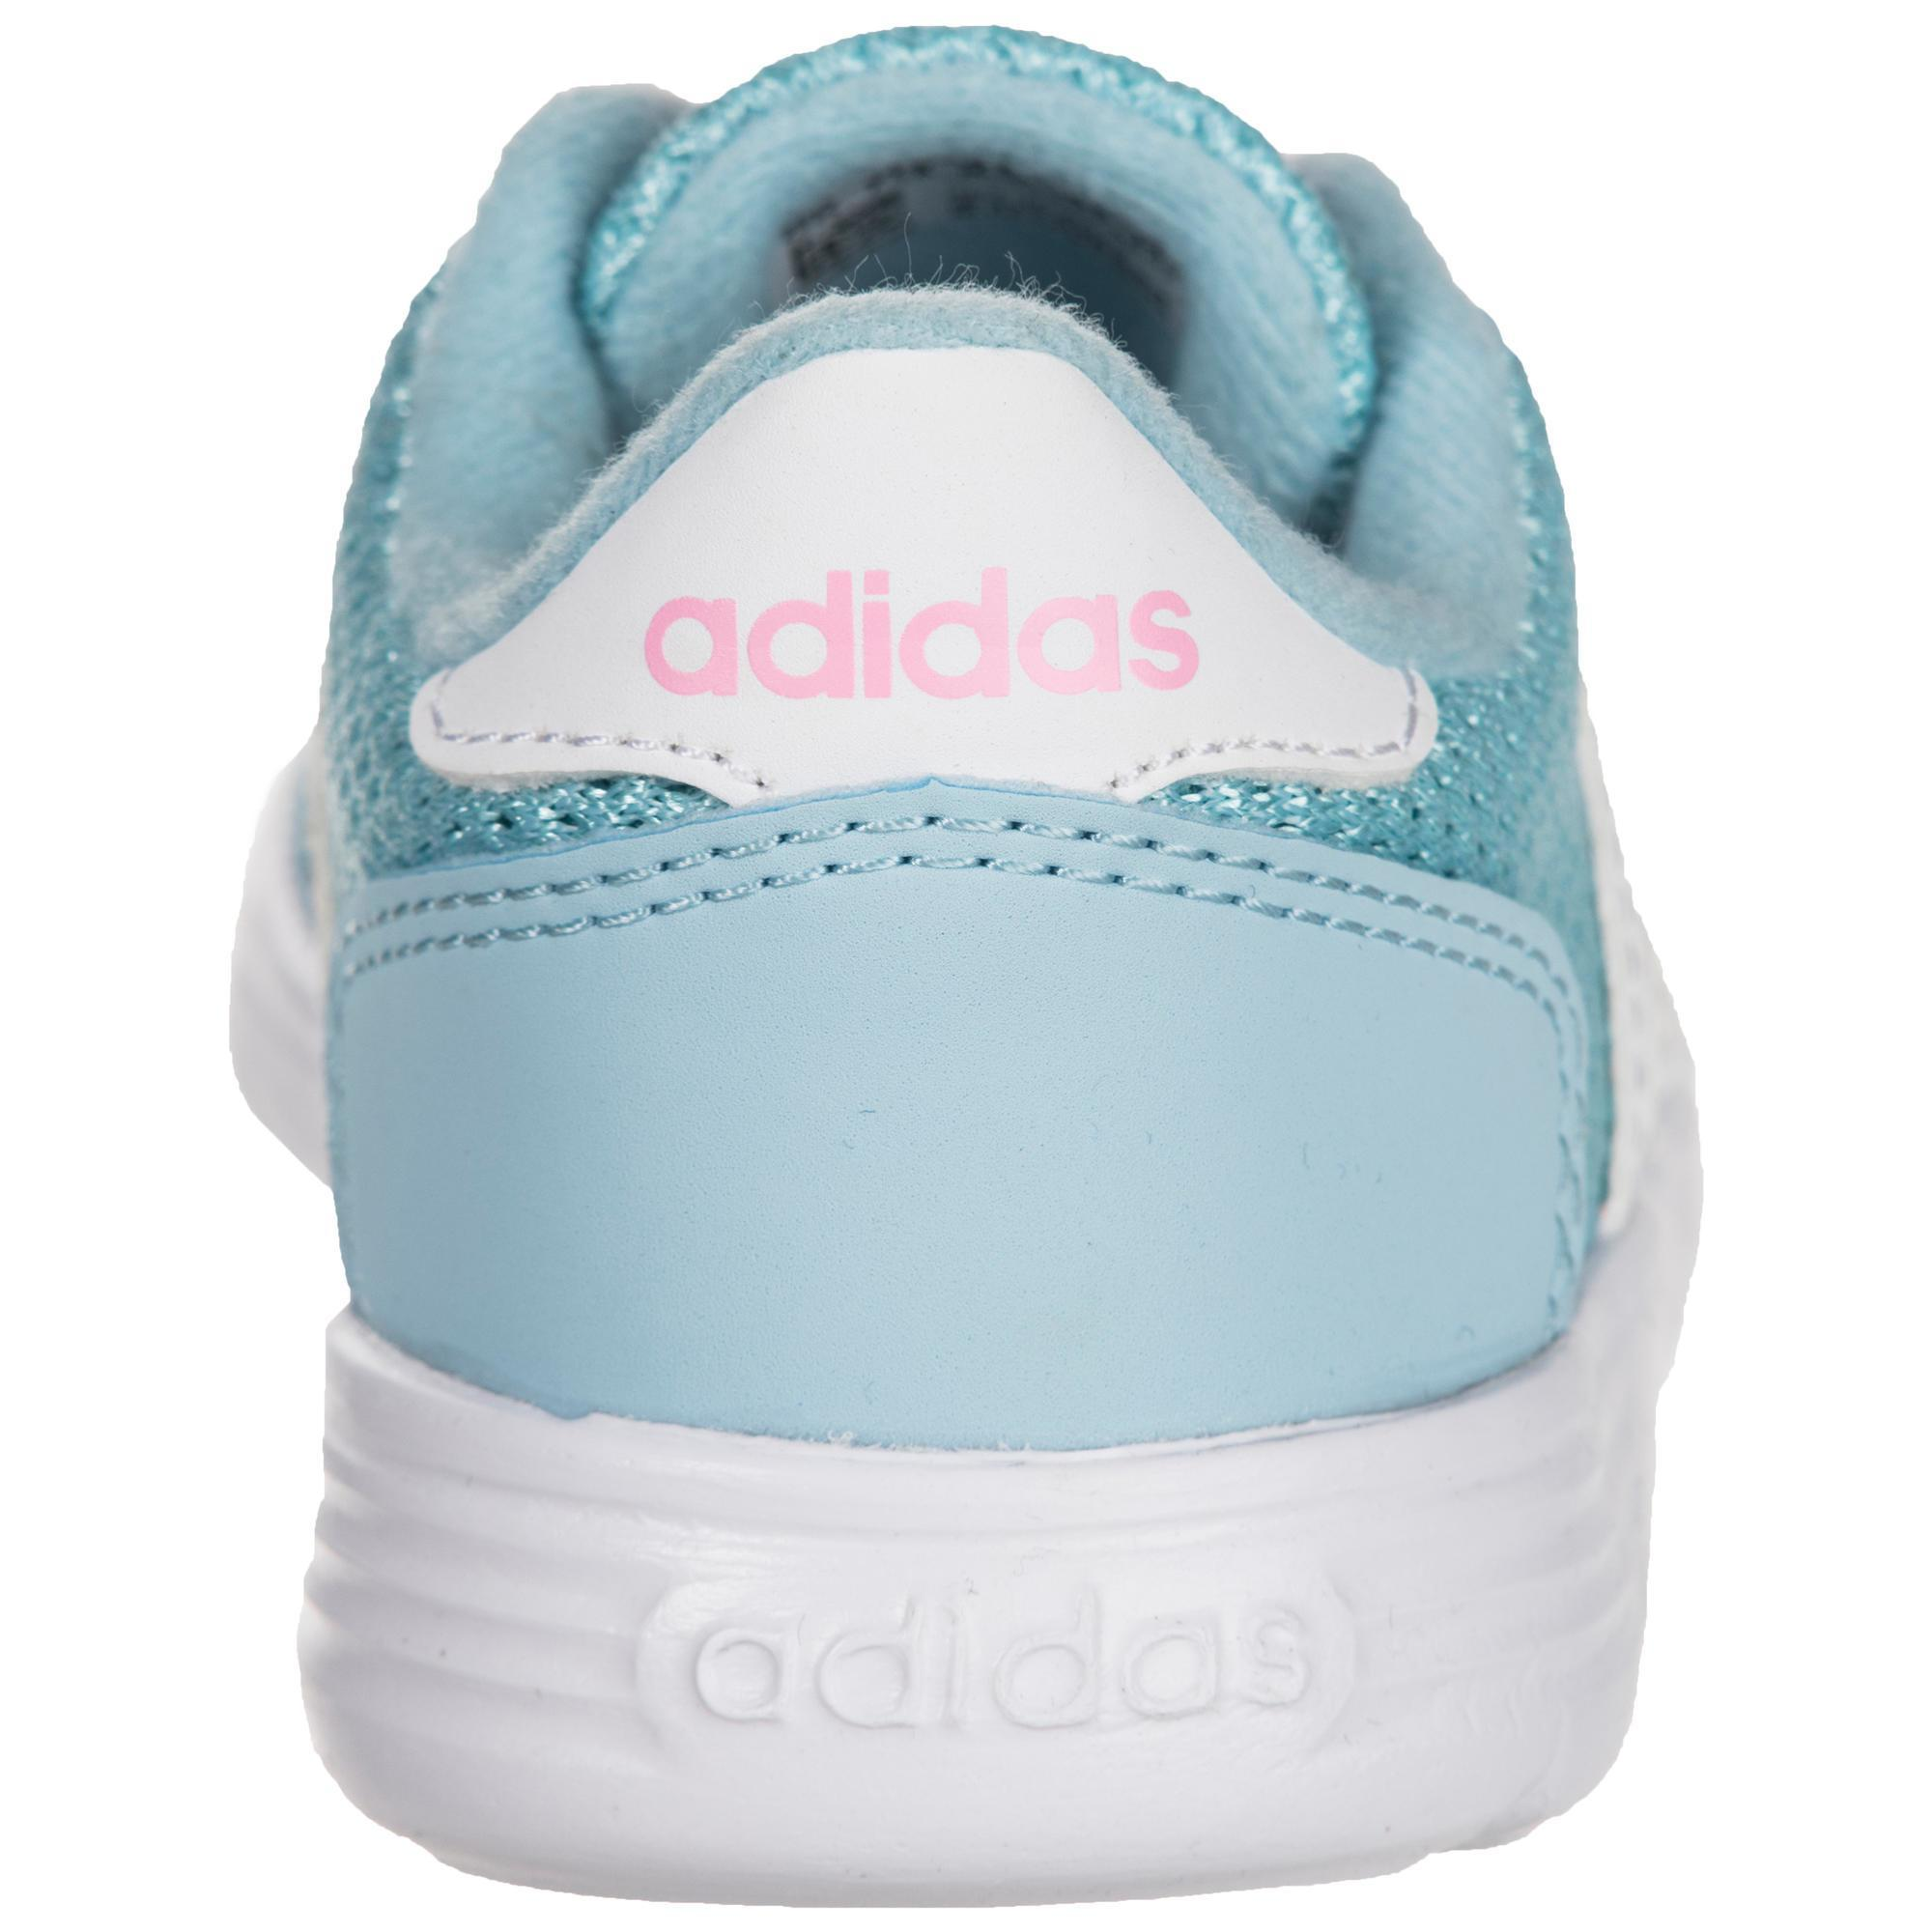 52e16487449f Bleu Fille Adidas Blanc Bébé Gym Chaussures Decathlon w7x7qpF1Wn